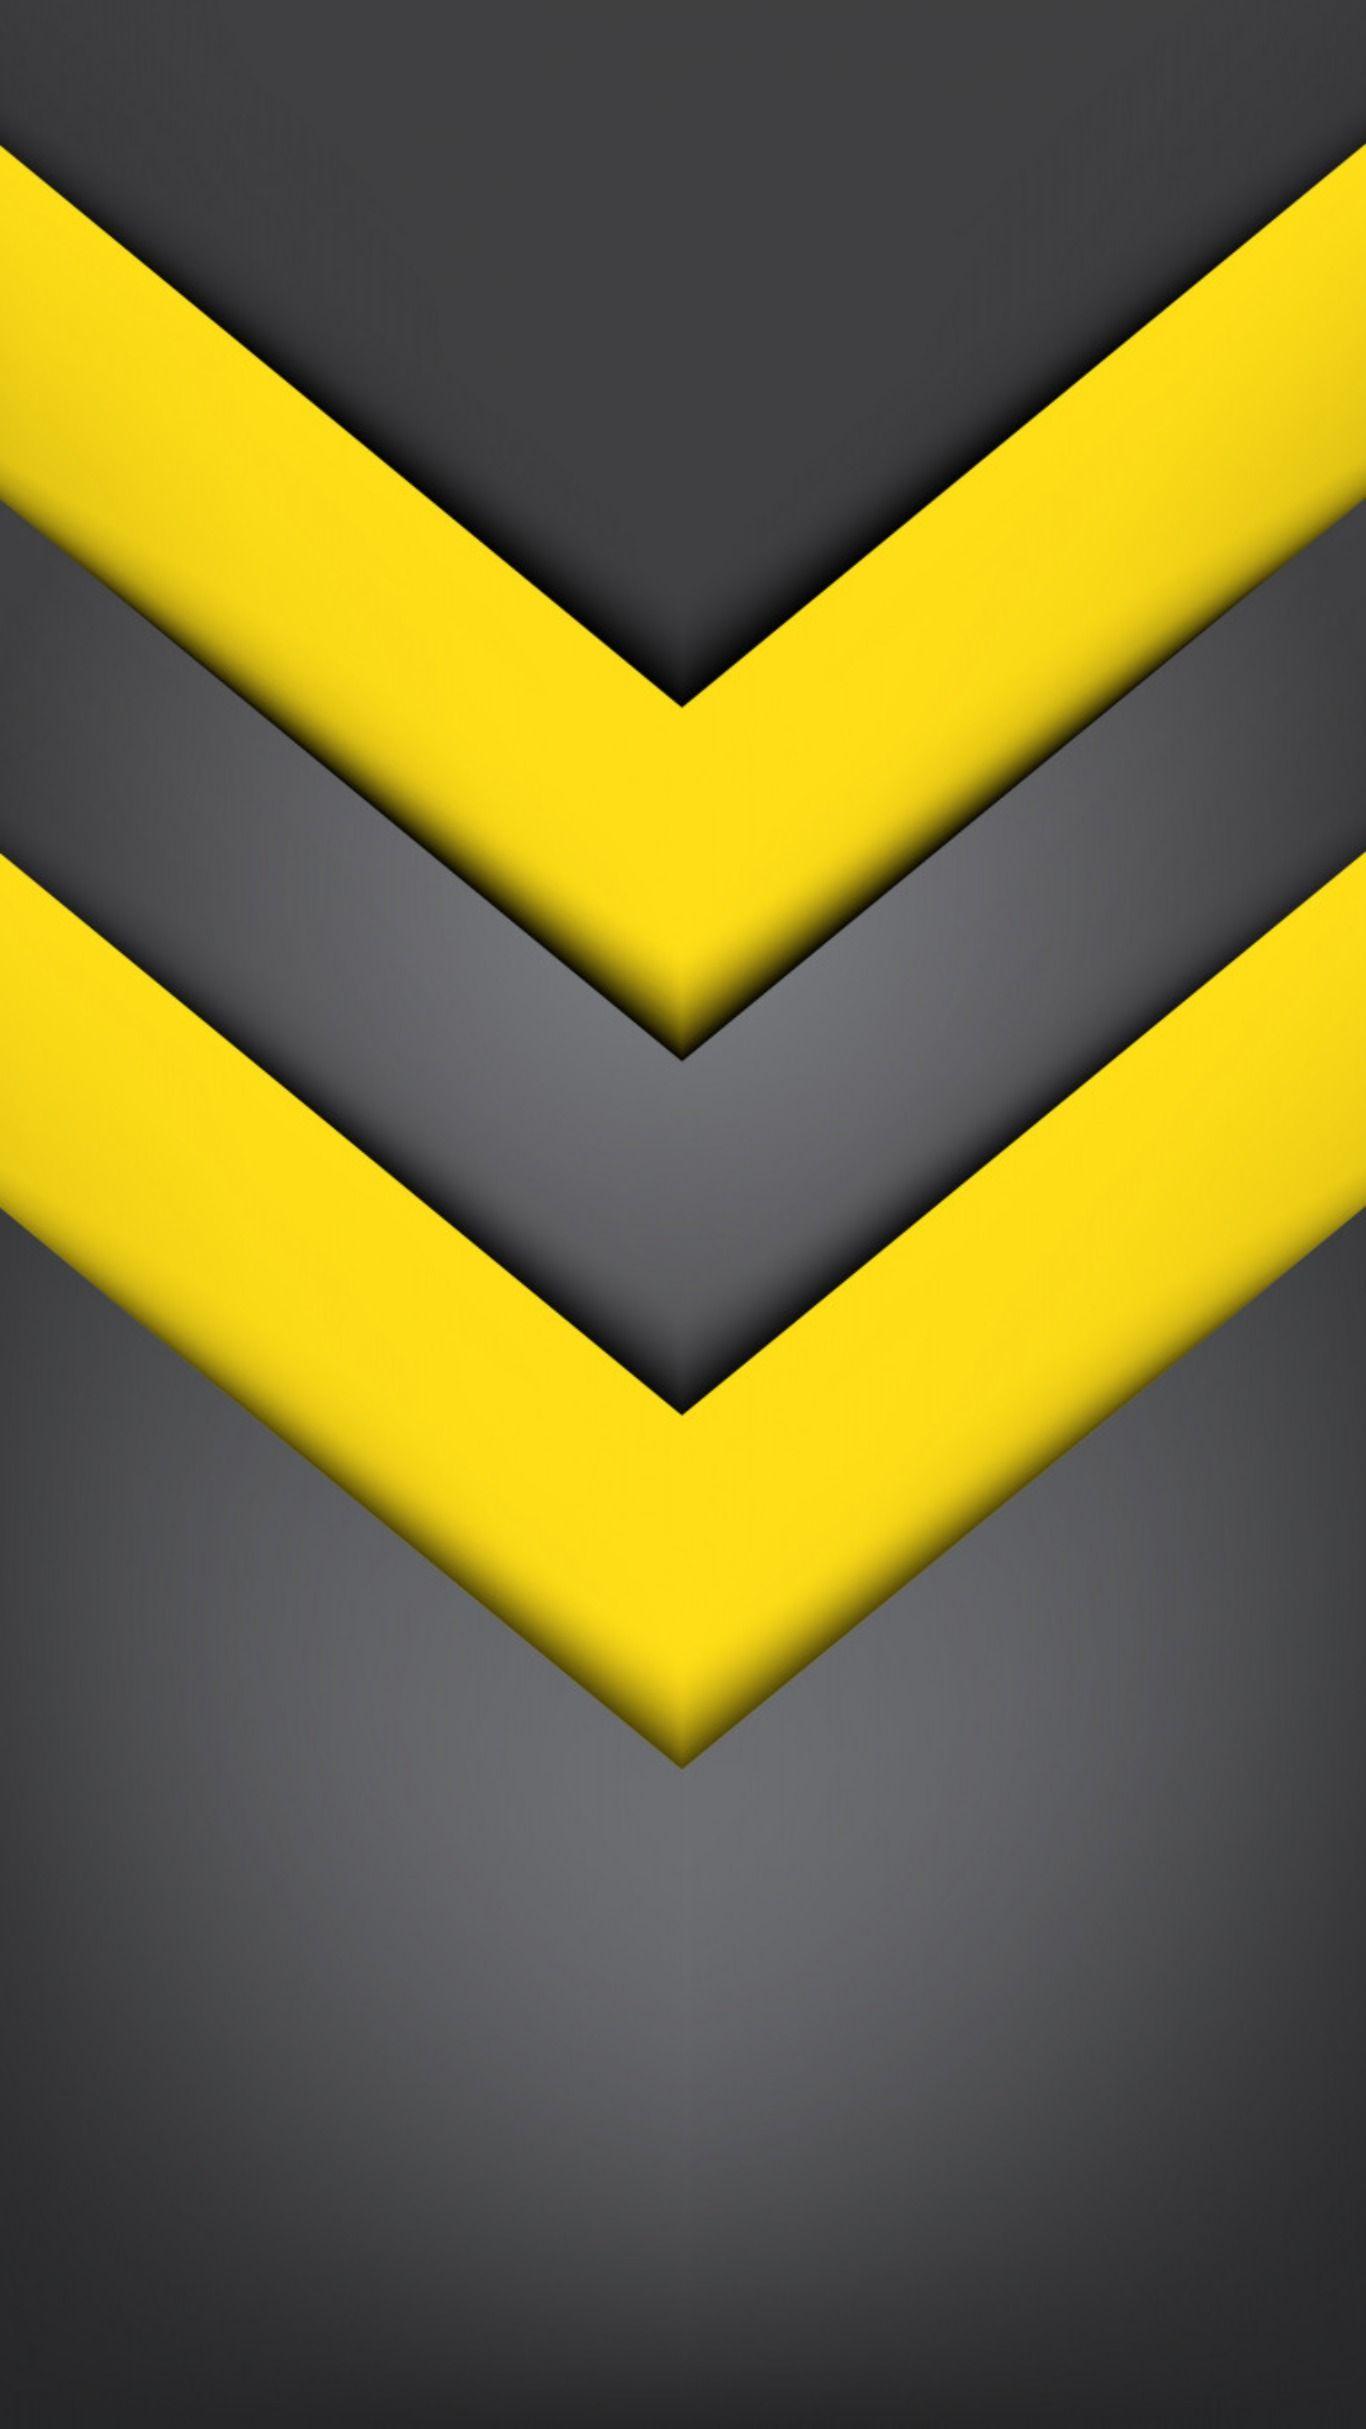 Abstract Yellow Black Background Design Geometry Ultrahd 4k Hd Phone Wallpaper Geometric Mini In 2021 Black Background Design Samsung Galaxy Wallpaper Galaxy Wallpaper